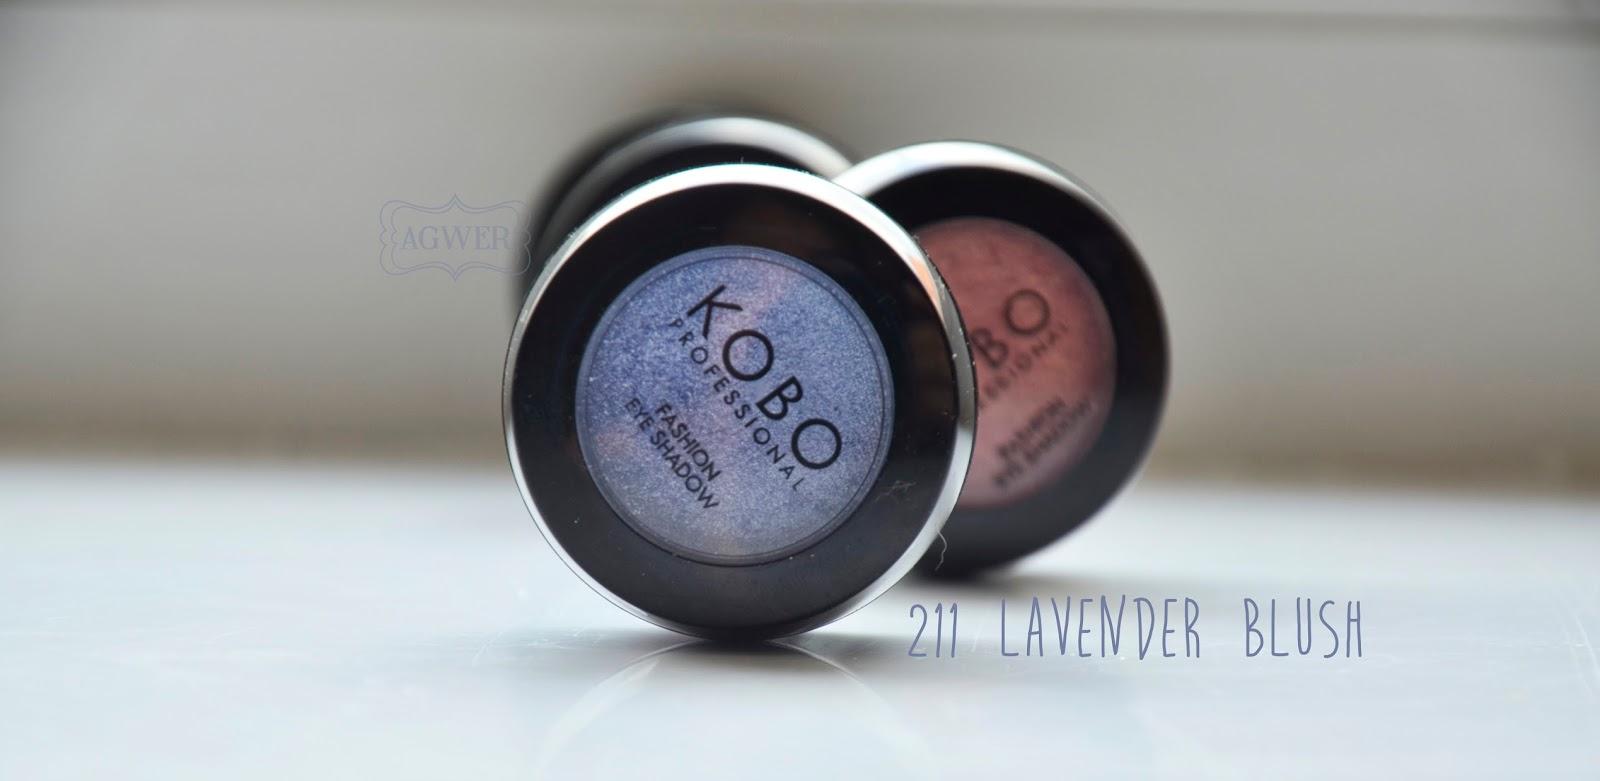 Kobo professional Lavender Blush